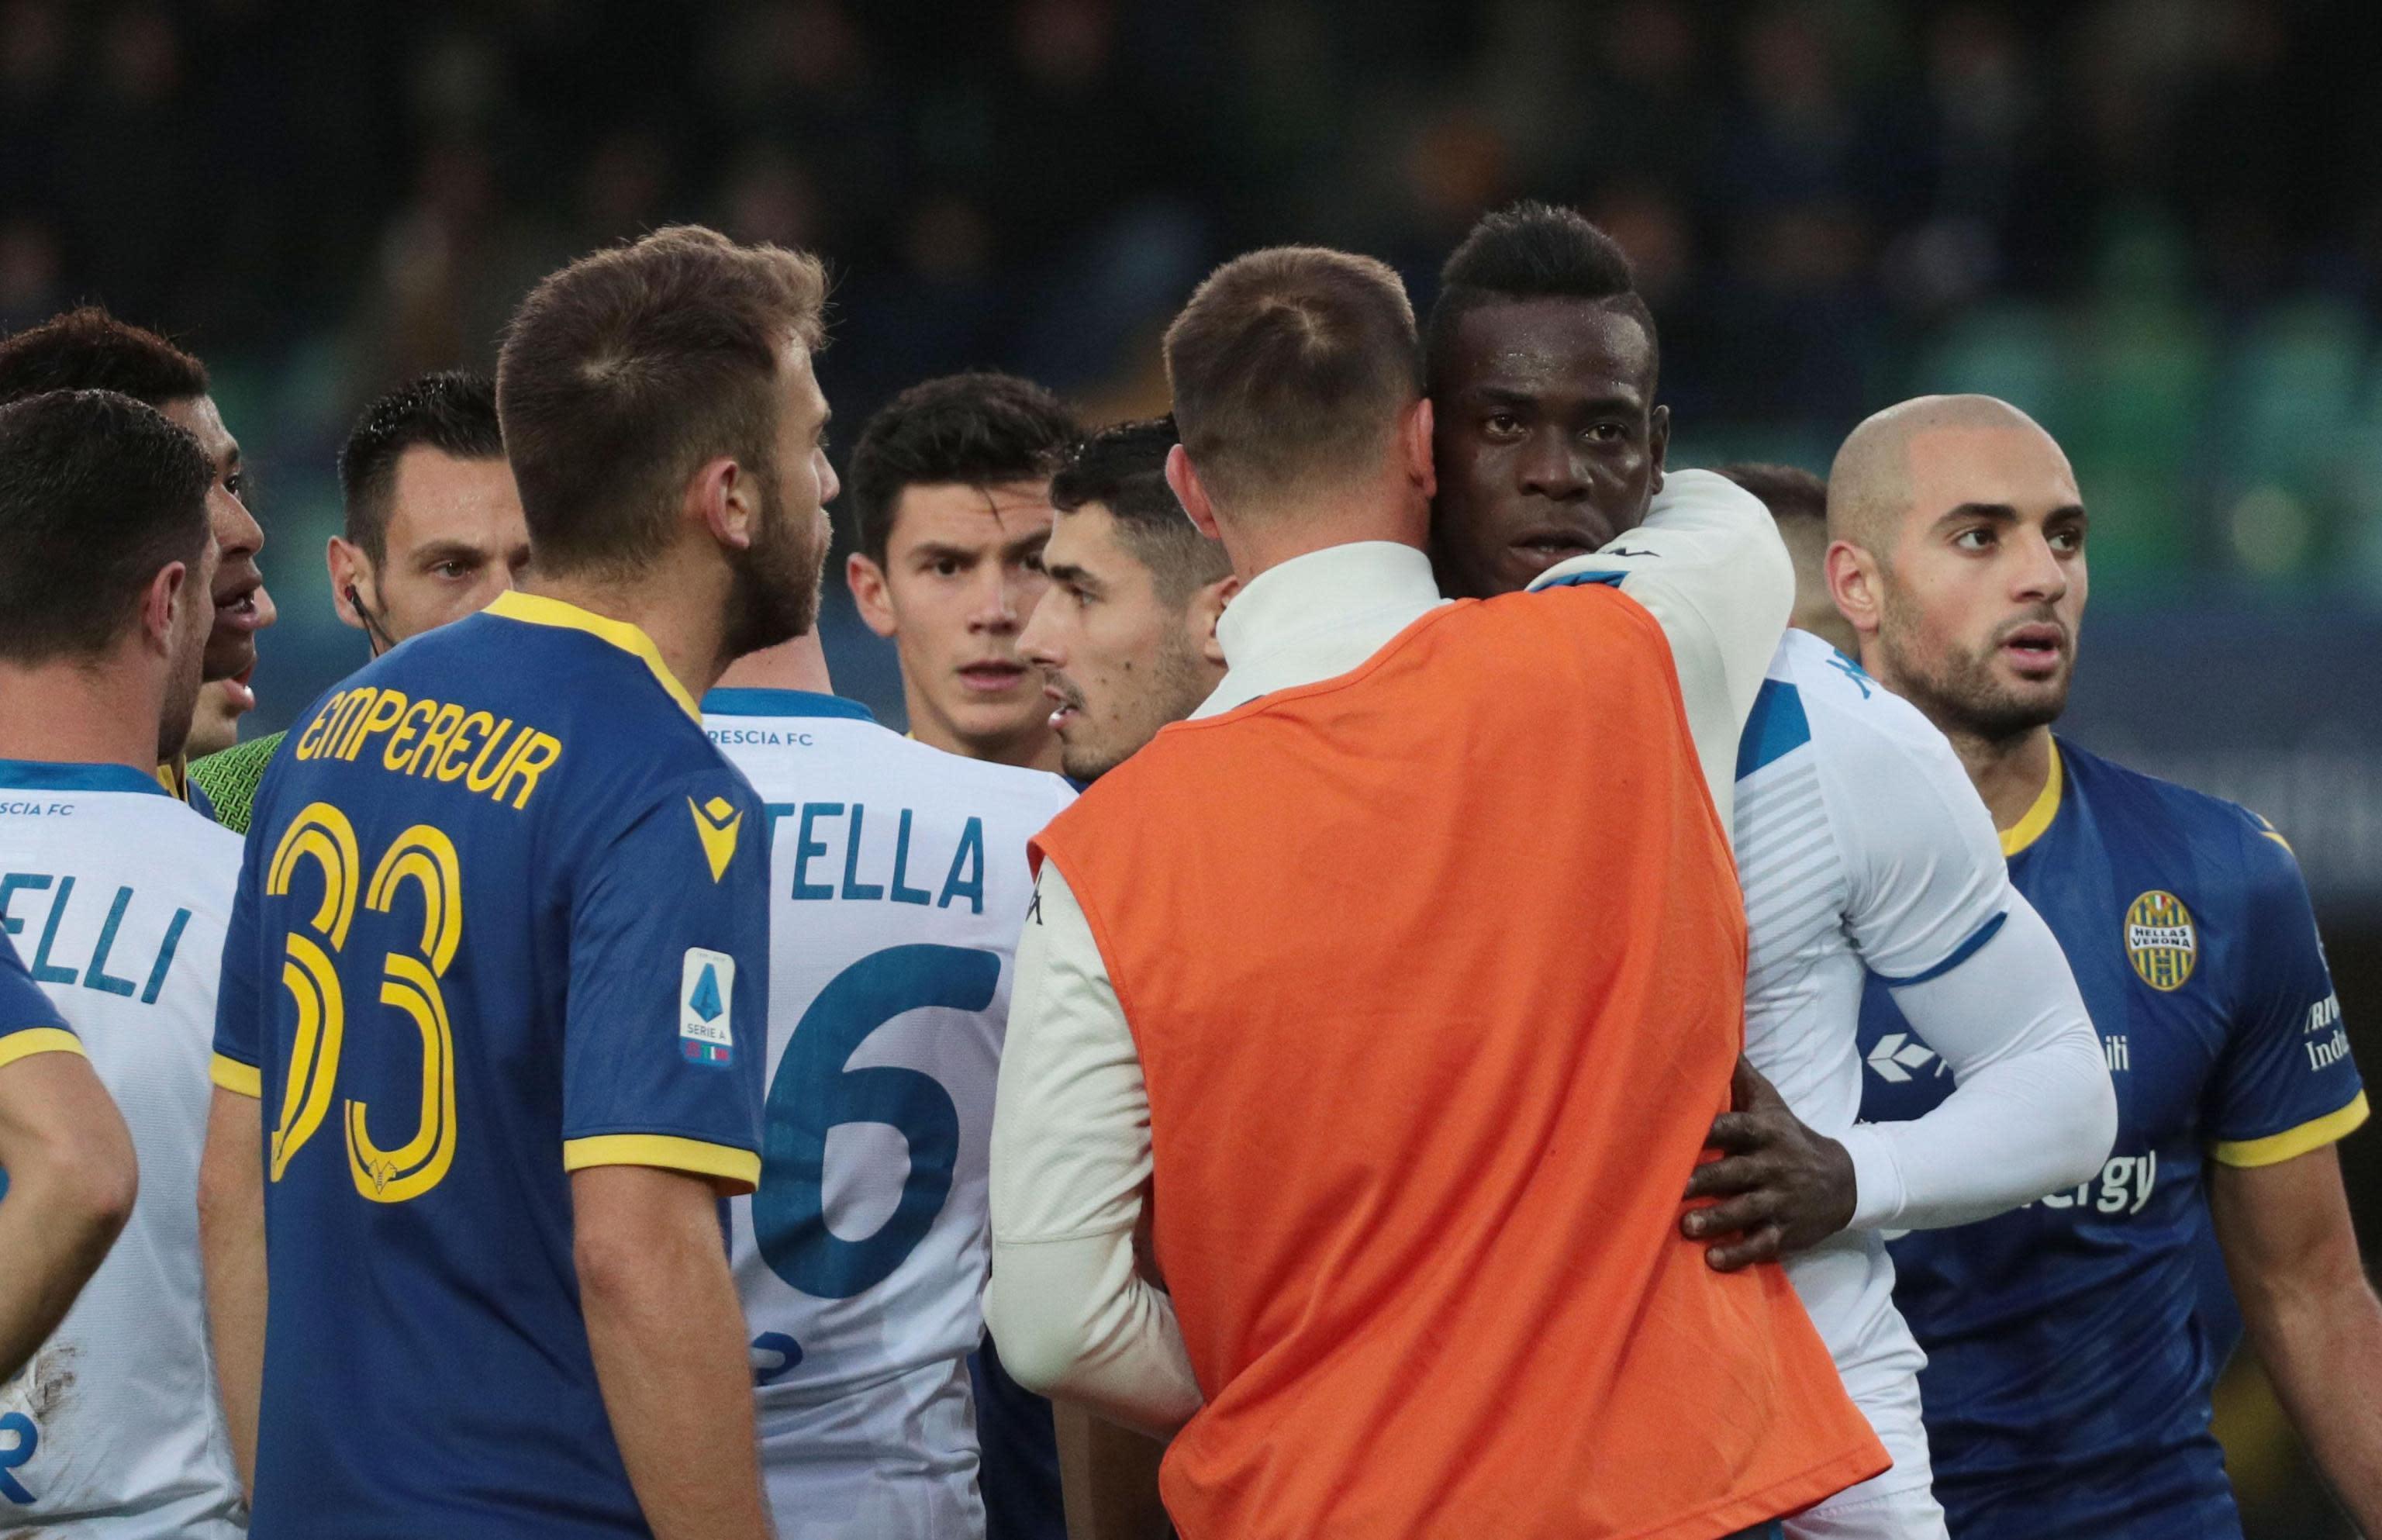 Brescia's Mario Balotelli, second from right, reacts to Verona supporters' racist chants during the Italian Serie A soccer match between Verona and Brescia at the Bentegodi stadium in Verona, Italy, Sunday, Nov. 3, 2019. (Simone Venezia/ANSA via AP)